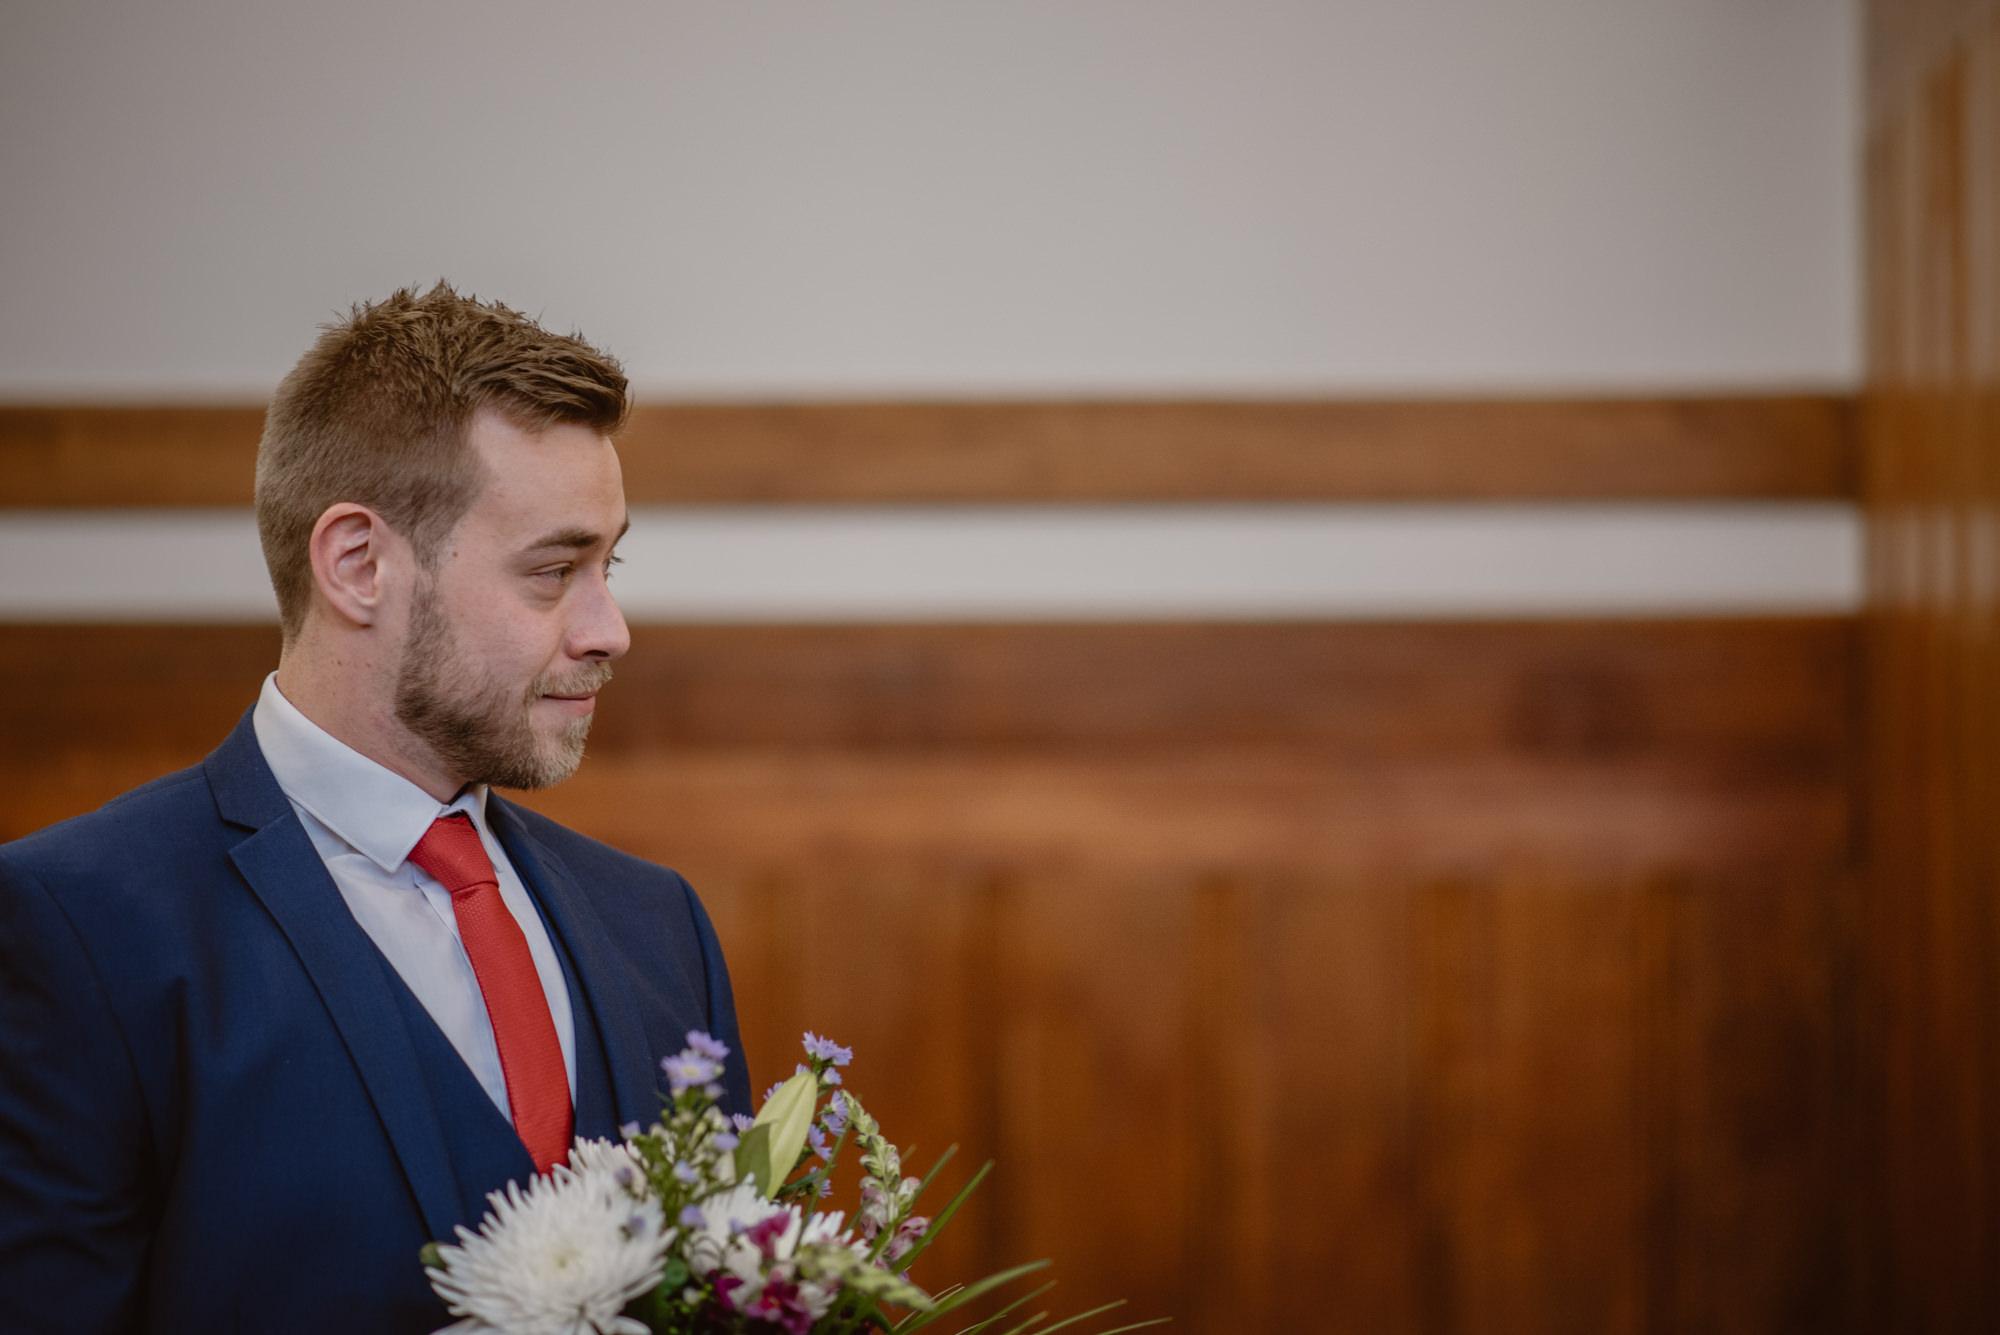 Jacqueline-Gareth-Wedding-Westmead-Events-Surrey-Manu-Mendoza-Wedding-Photography-035.jpg